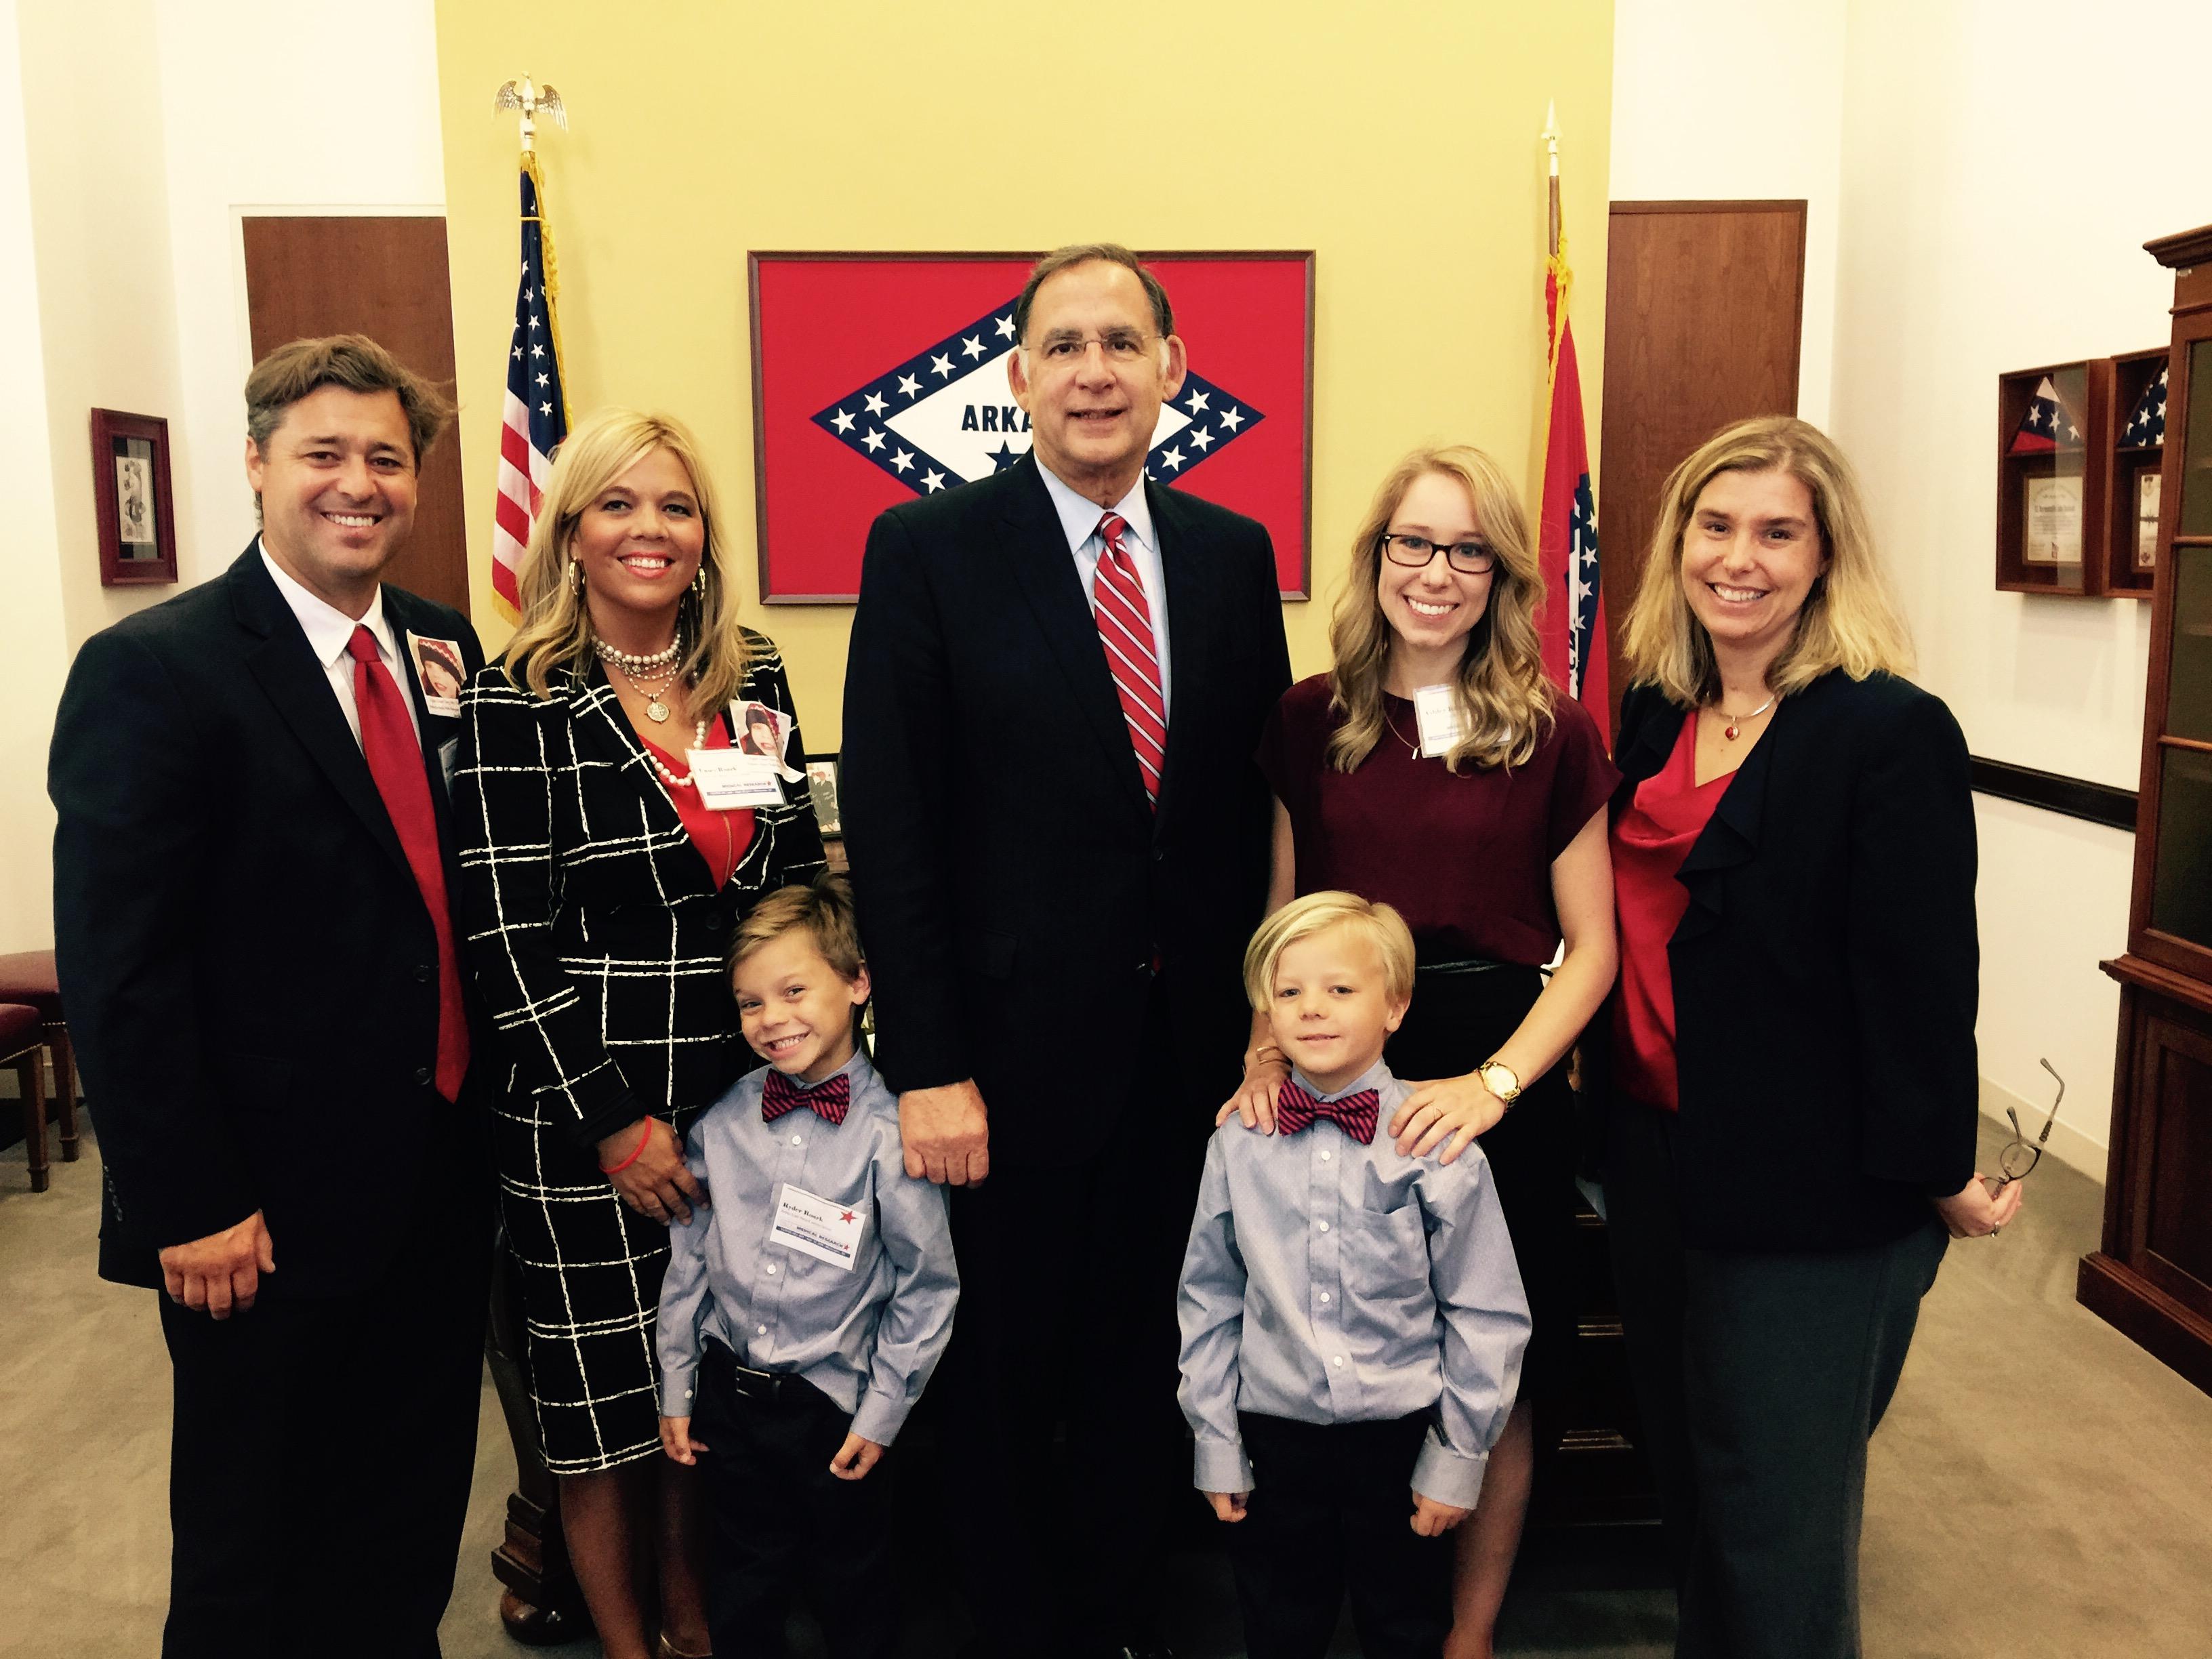 Ryder and his family with Sen. John Boozman.